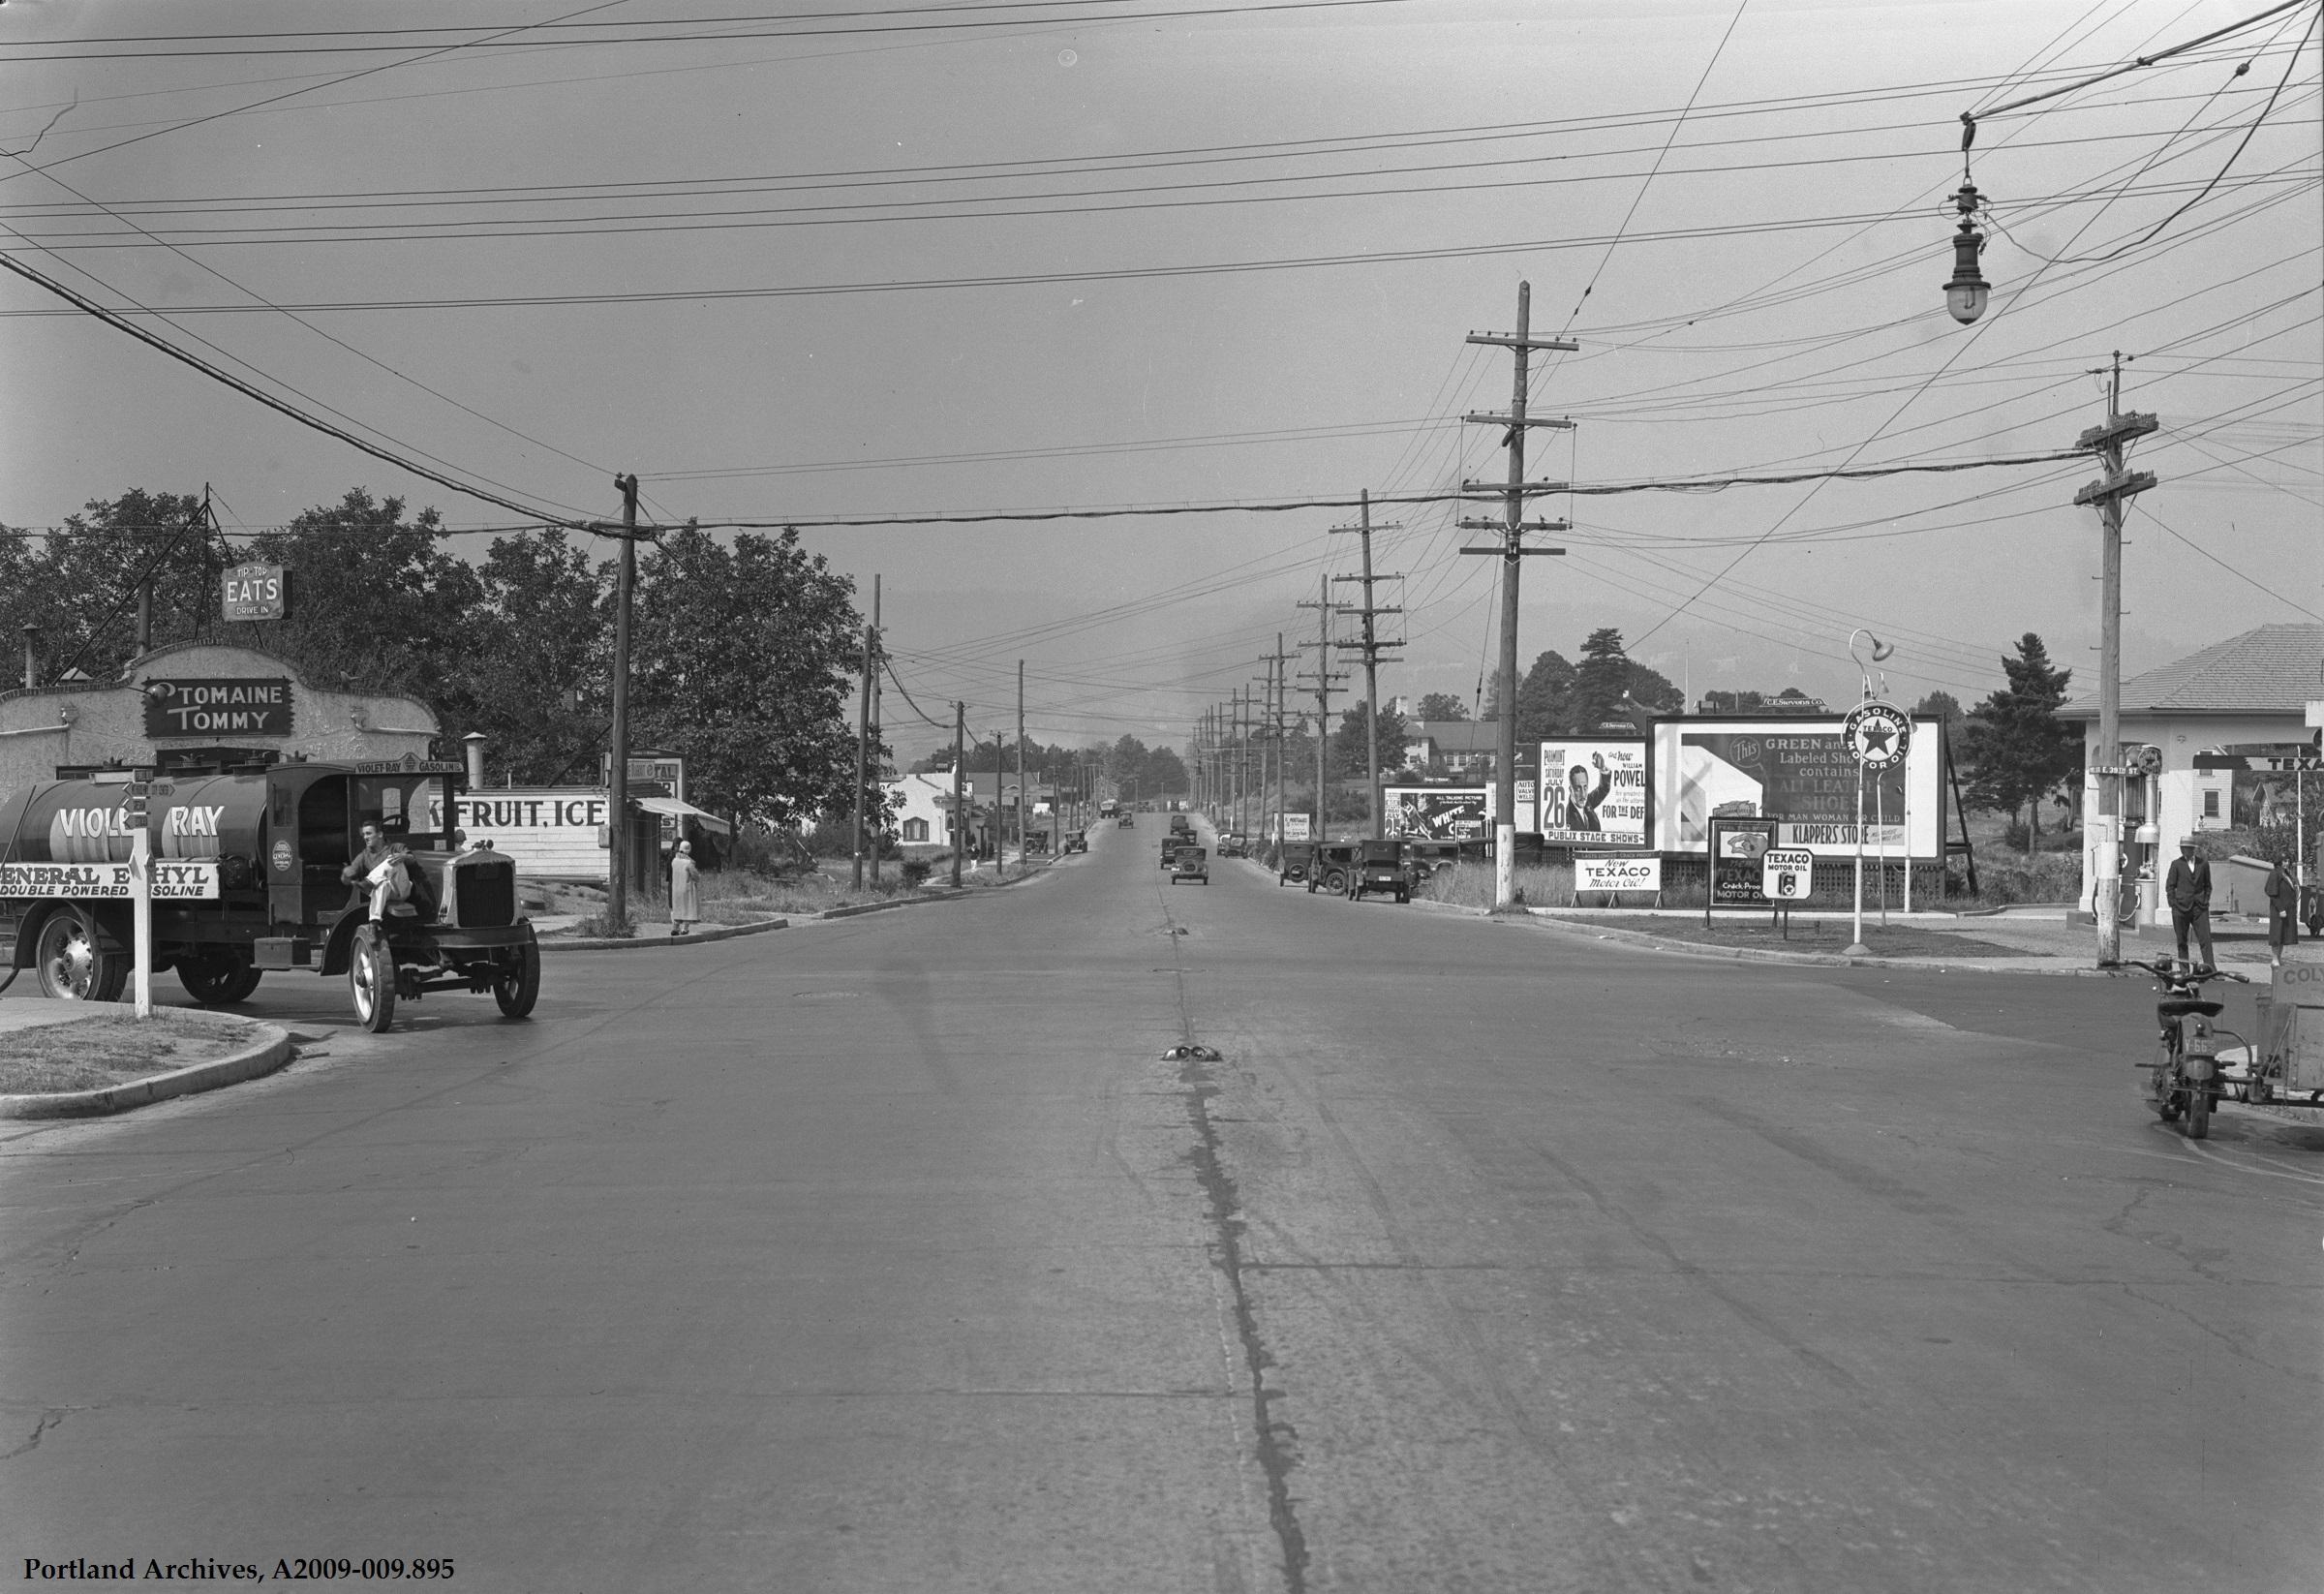 City of Portland Archives, Oregon, A2009-009.895